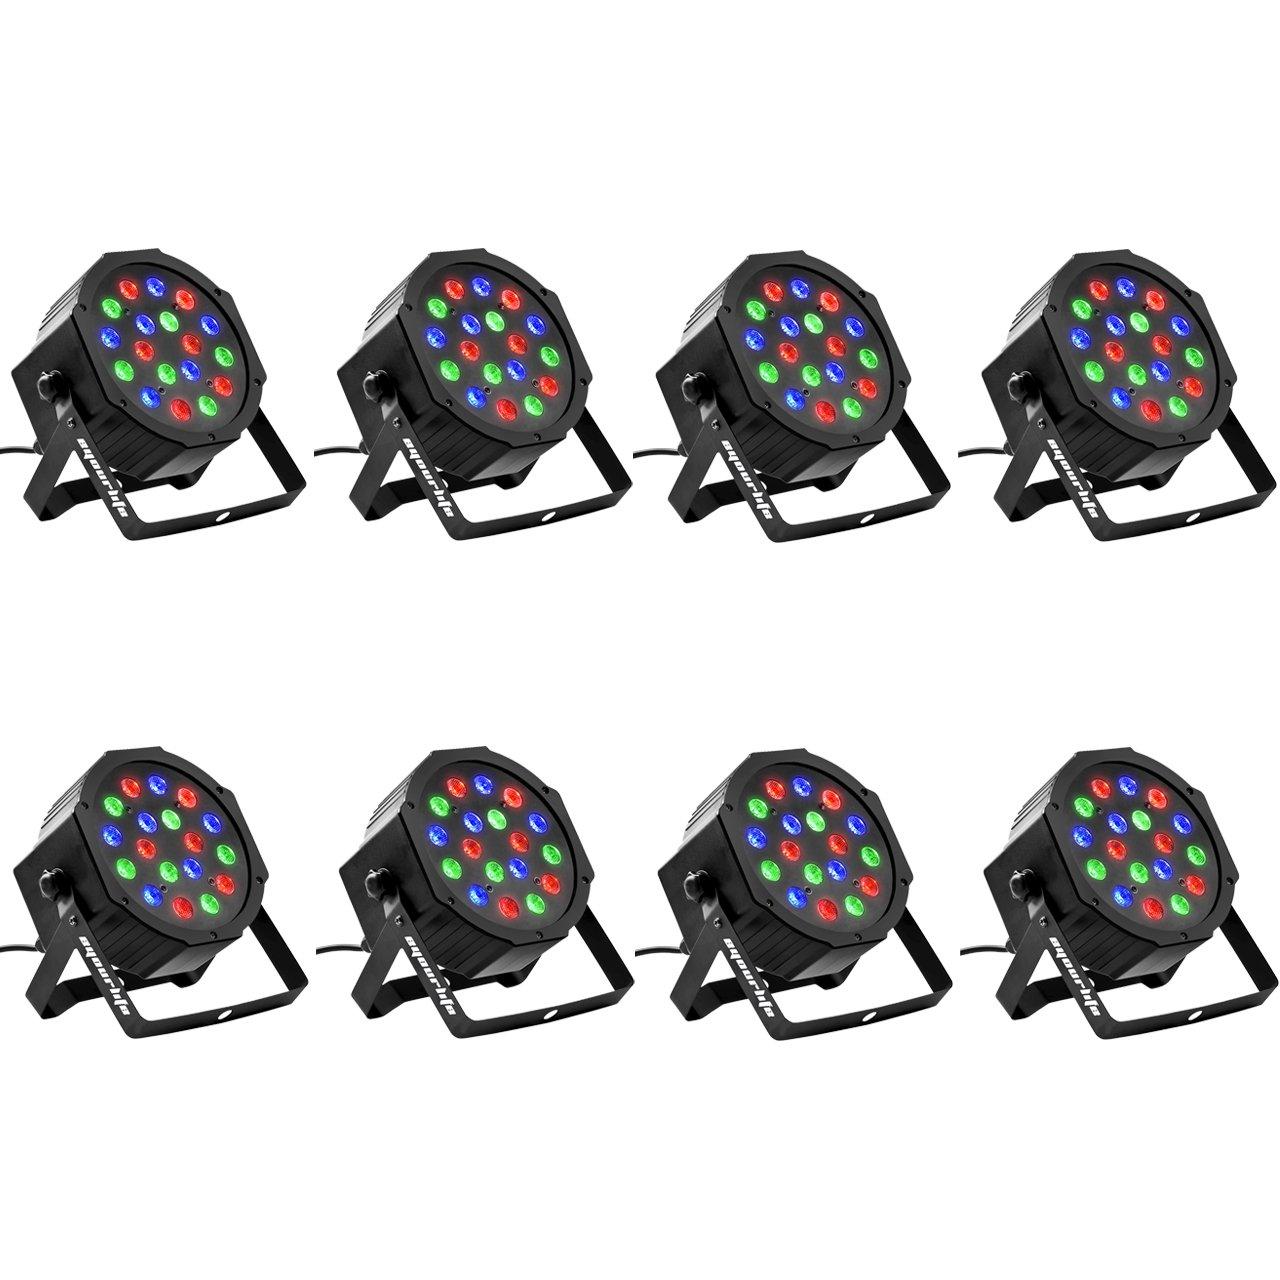 Eyourlife 8PCS 18 X 3W LED Stage Light DJ Par Lights 54W RGB Par 64 DMX512 Uplighting for Dj Stage Lighting Show Disco Party Light by Eyourlife